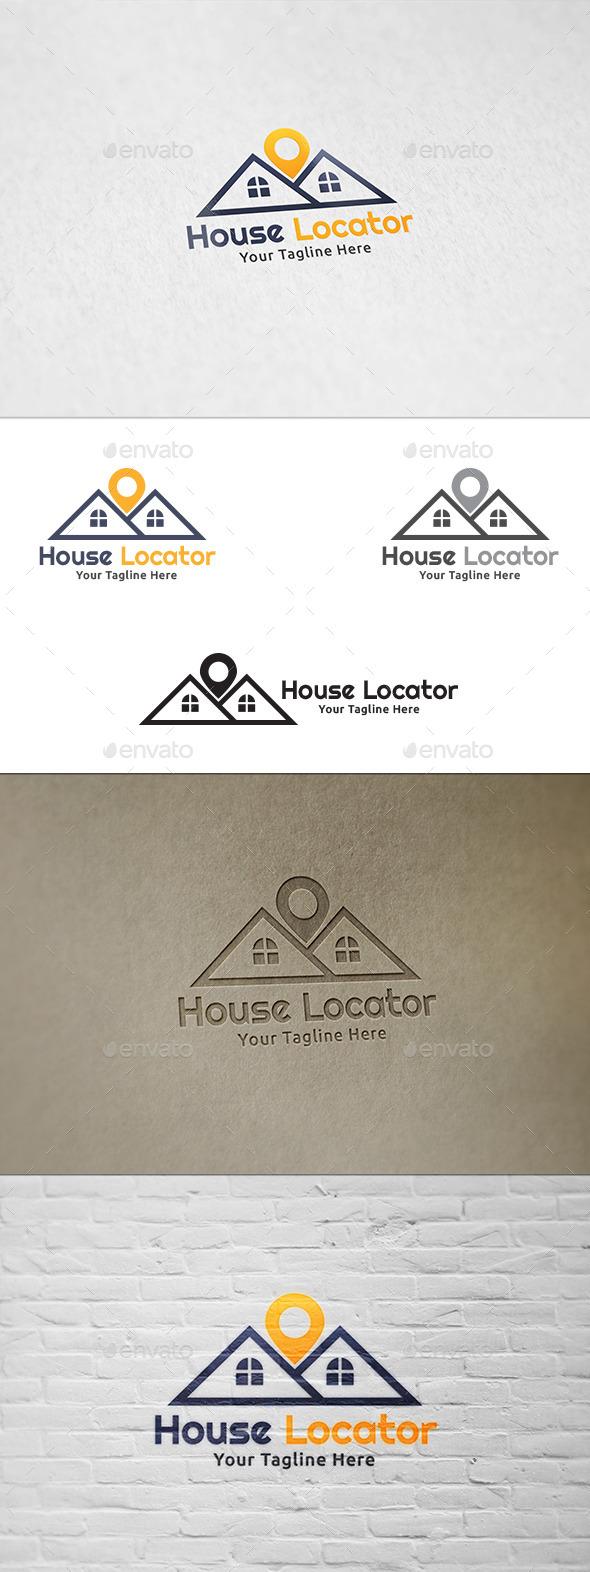 GraphicRiver House Locator Logo Template 8863342